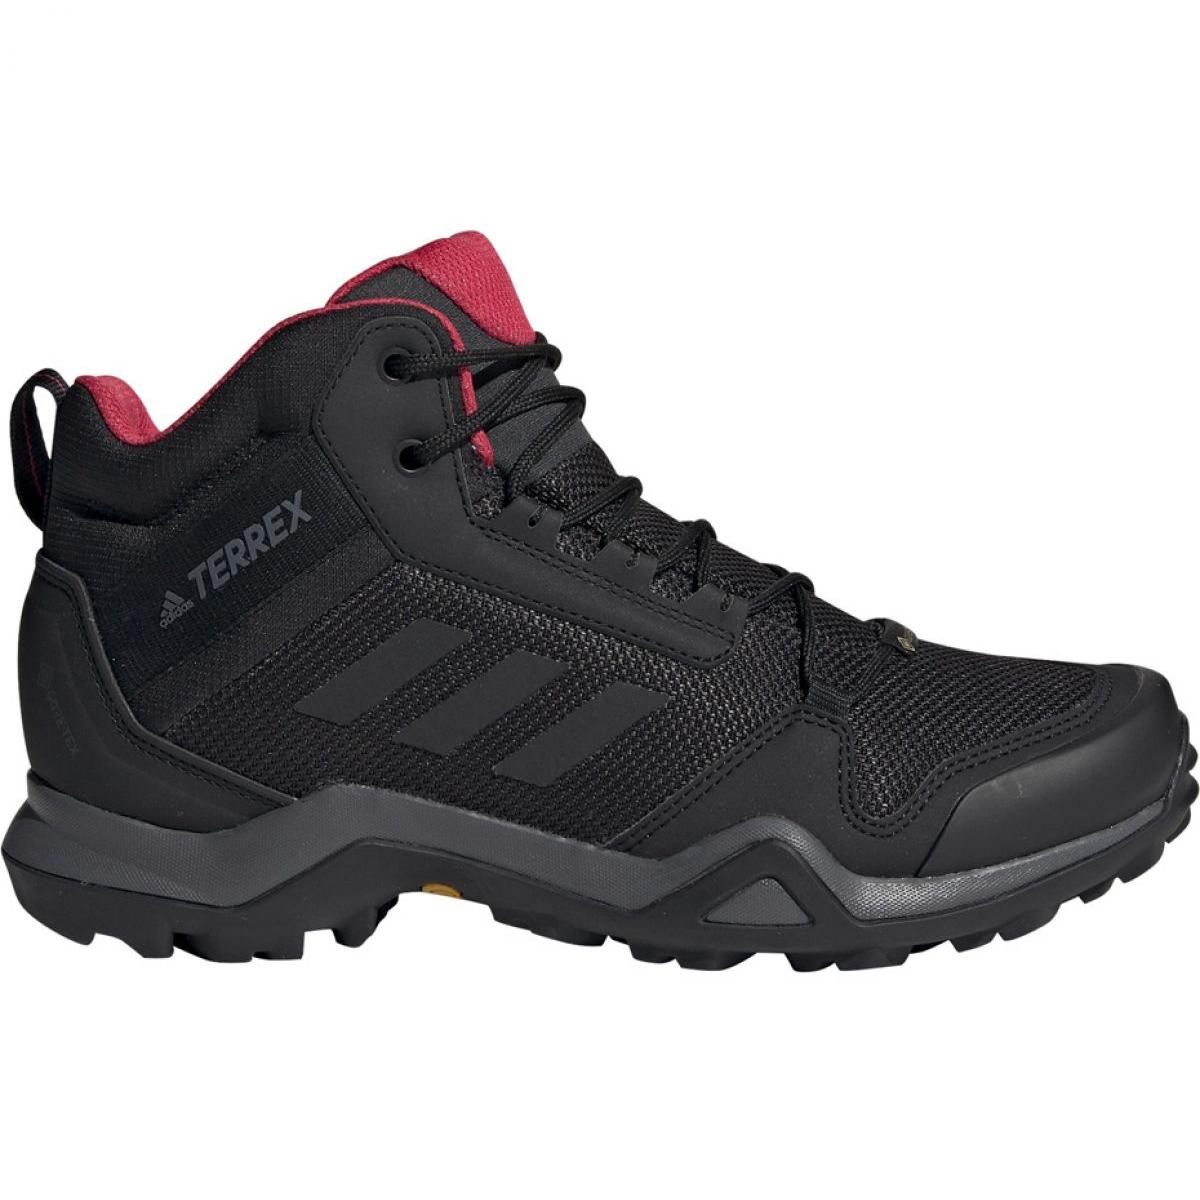 Schwarz Trekkingschuhe adidas Terrex AX3 Mid Gtx W BC0590